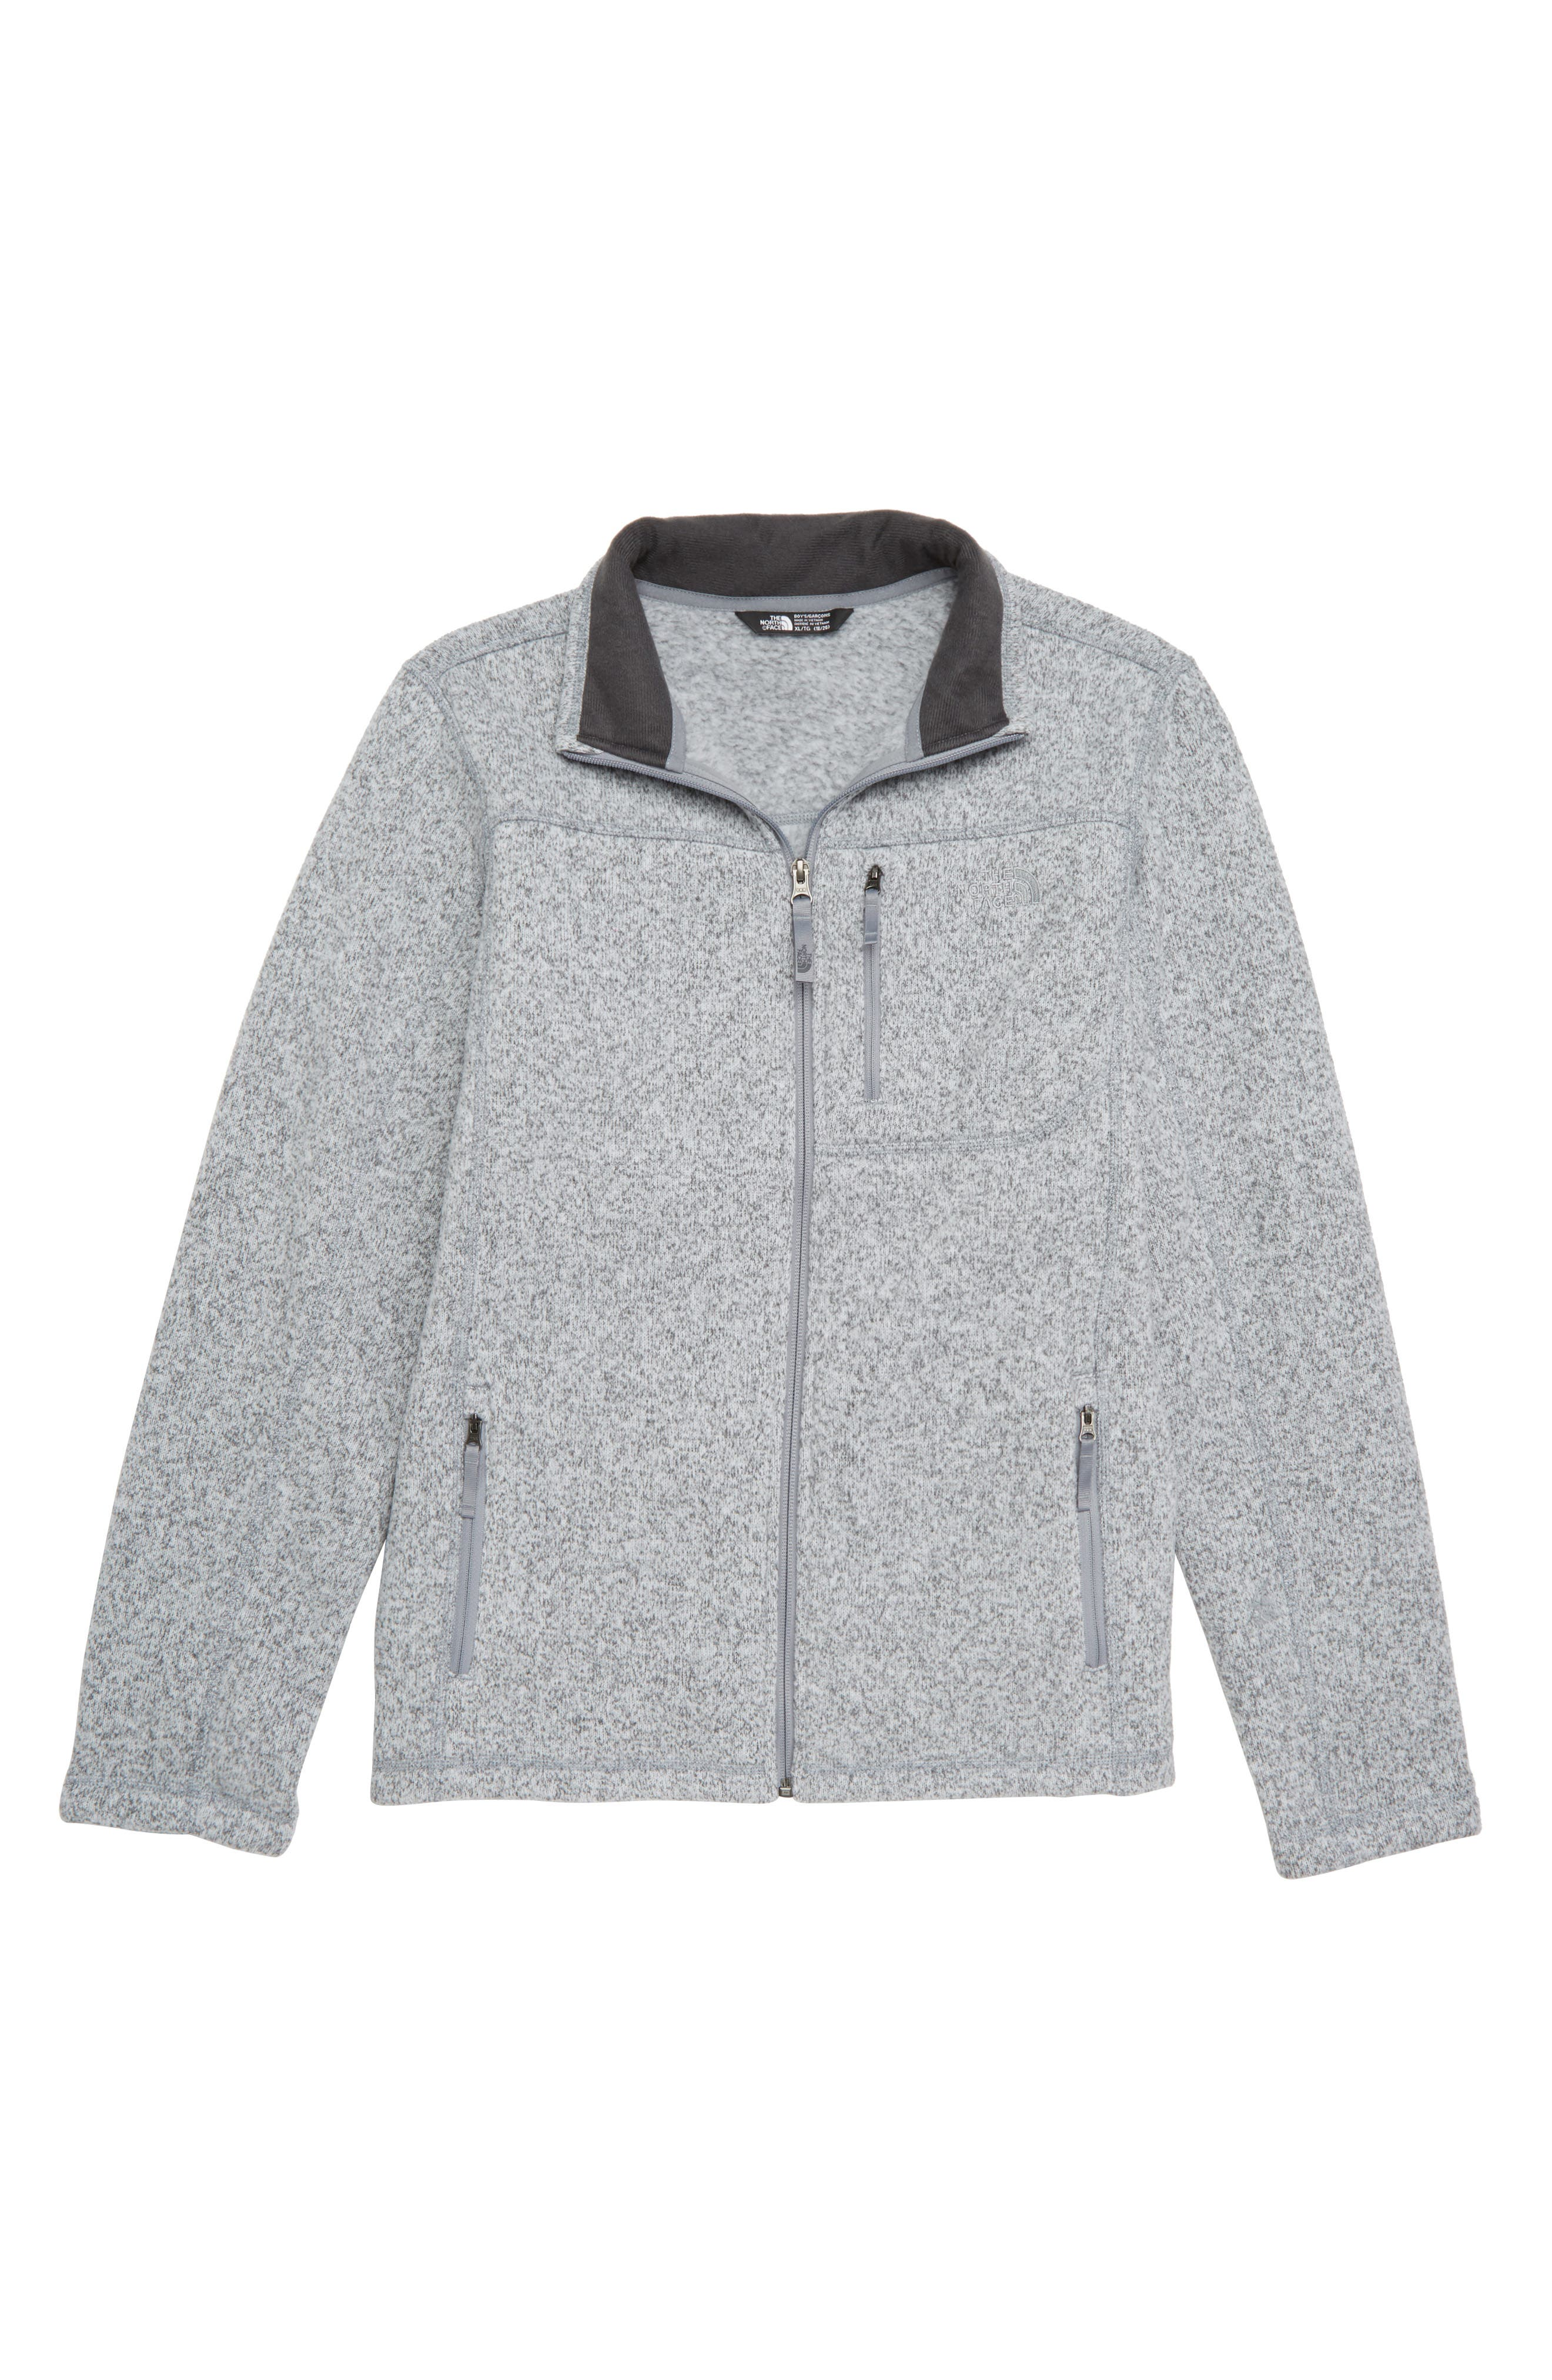 Gordon Lyons Sweater Fleece Zip Jacket,                             Main thumbnail 5, color,